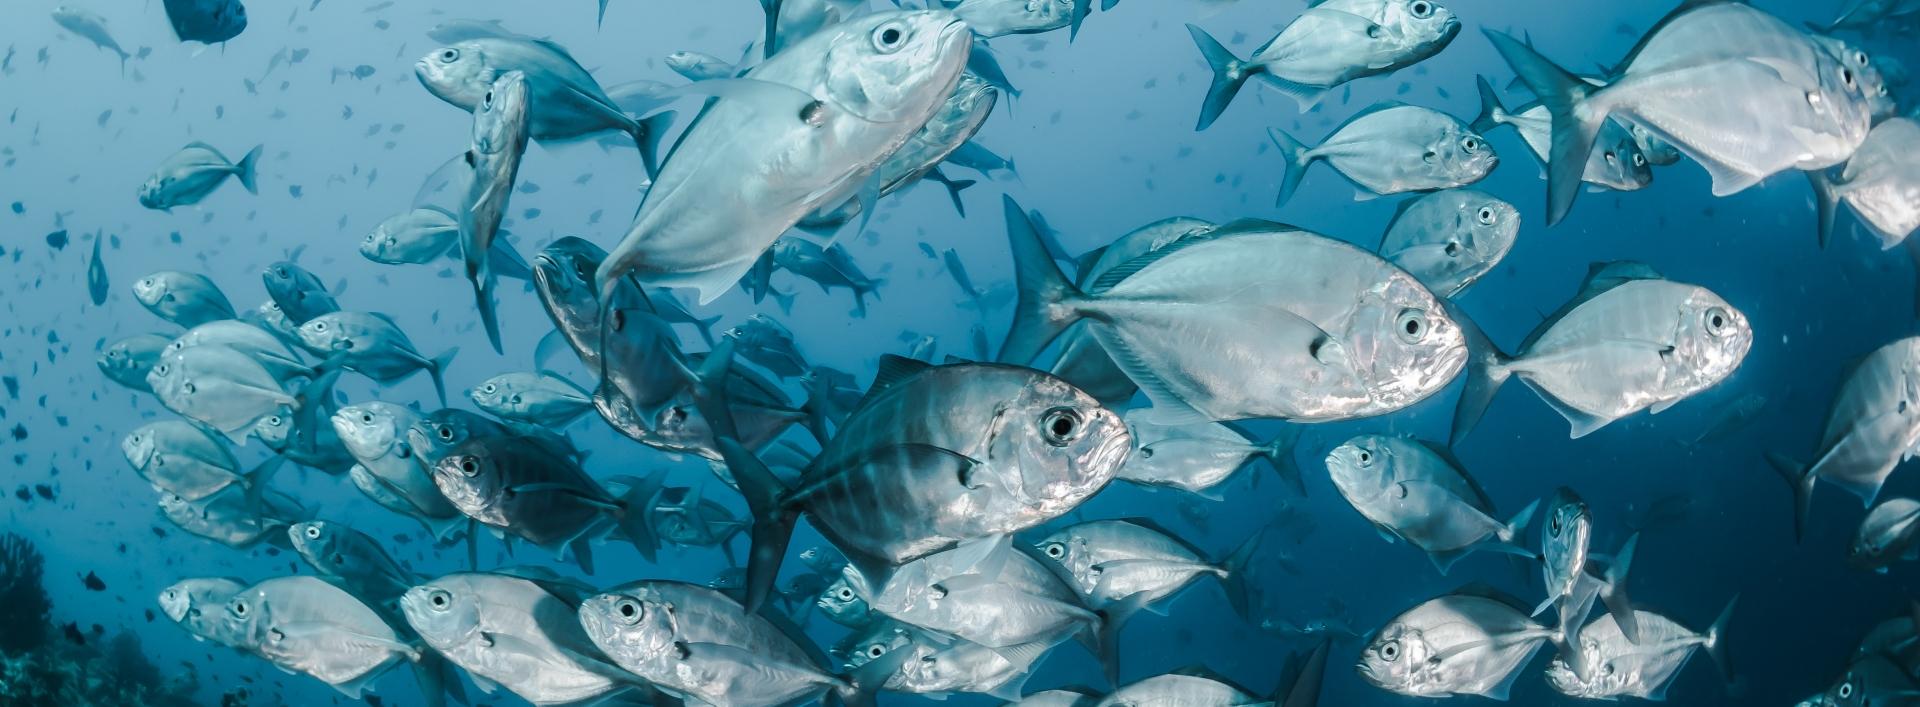 School of silver fish underwater